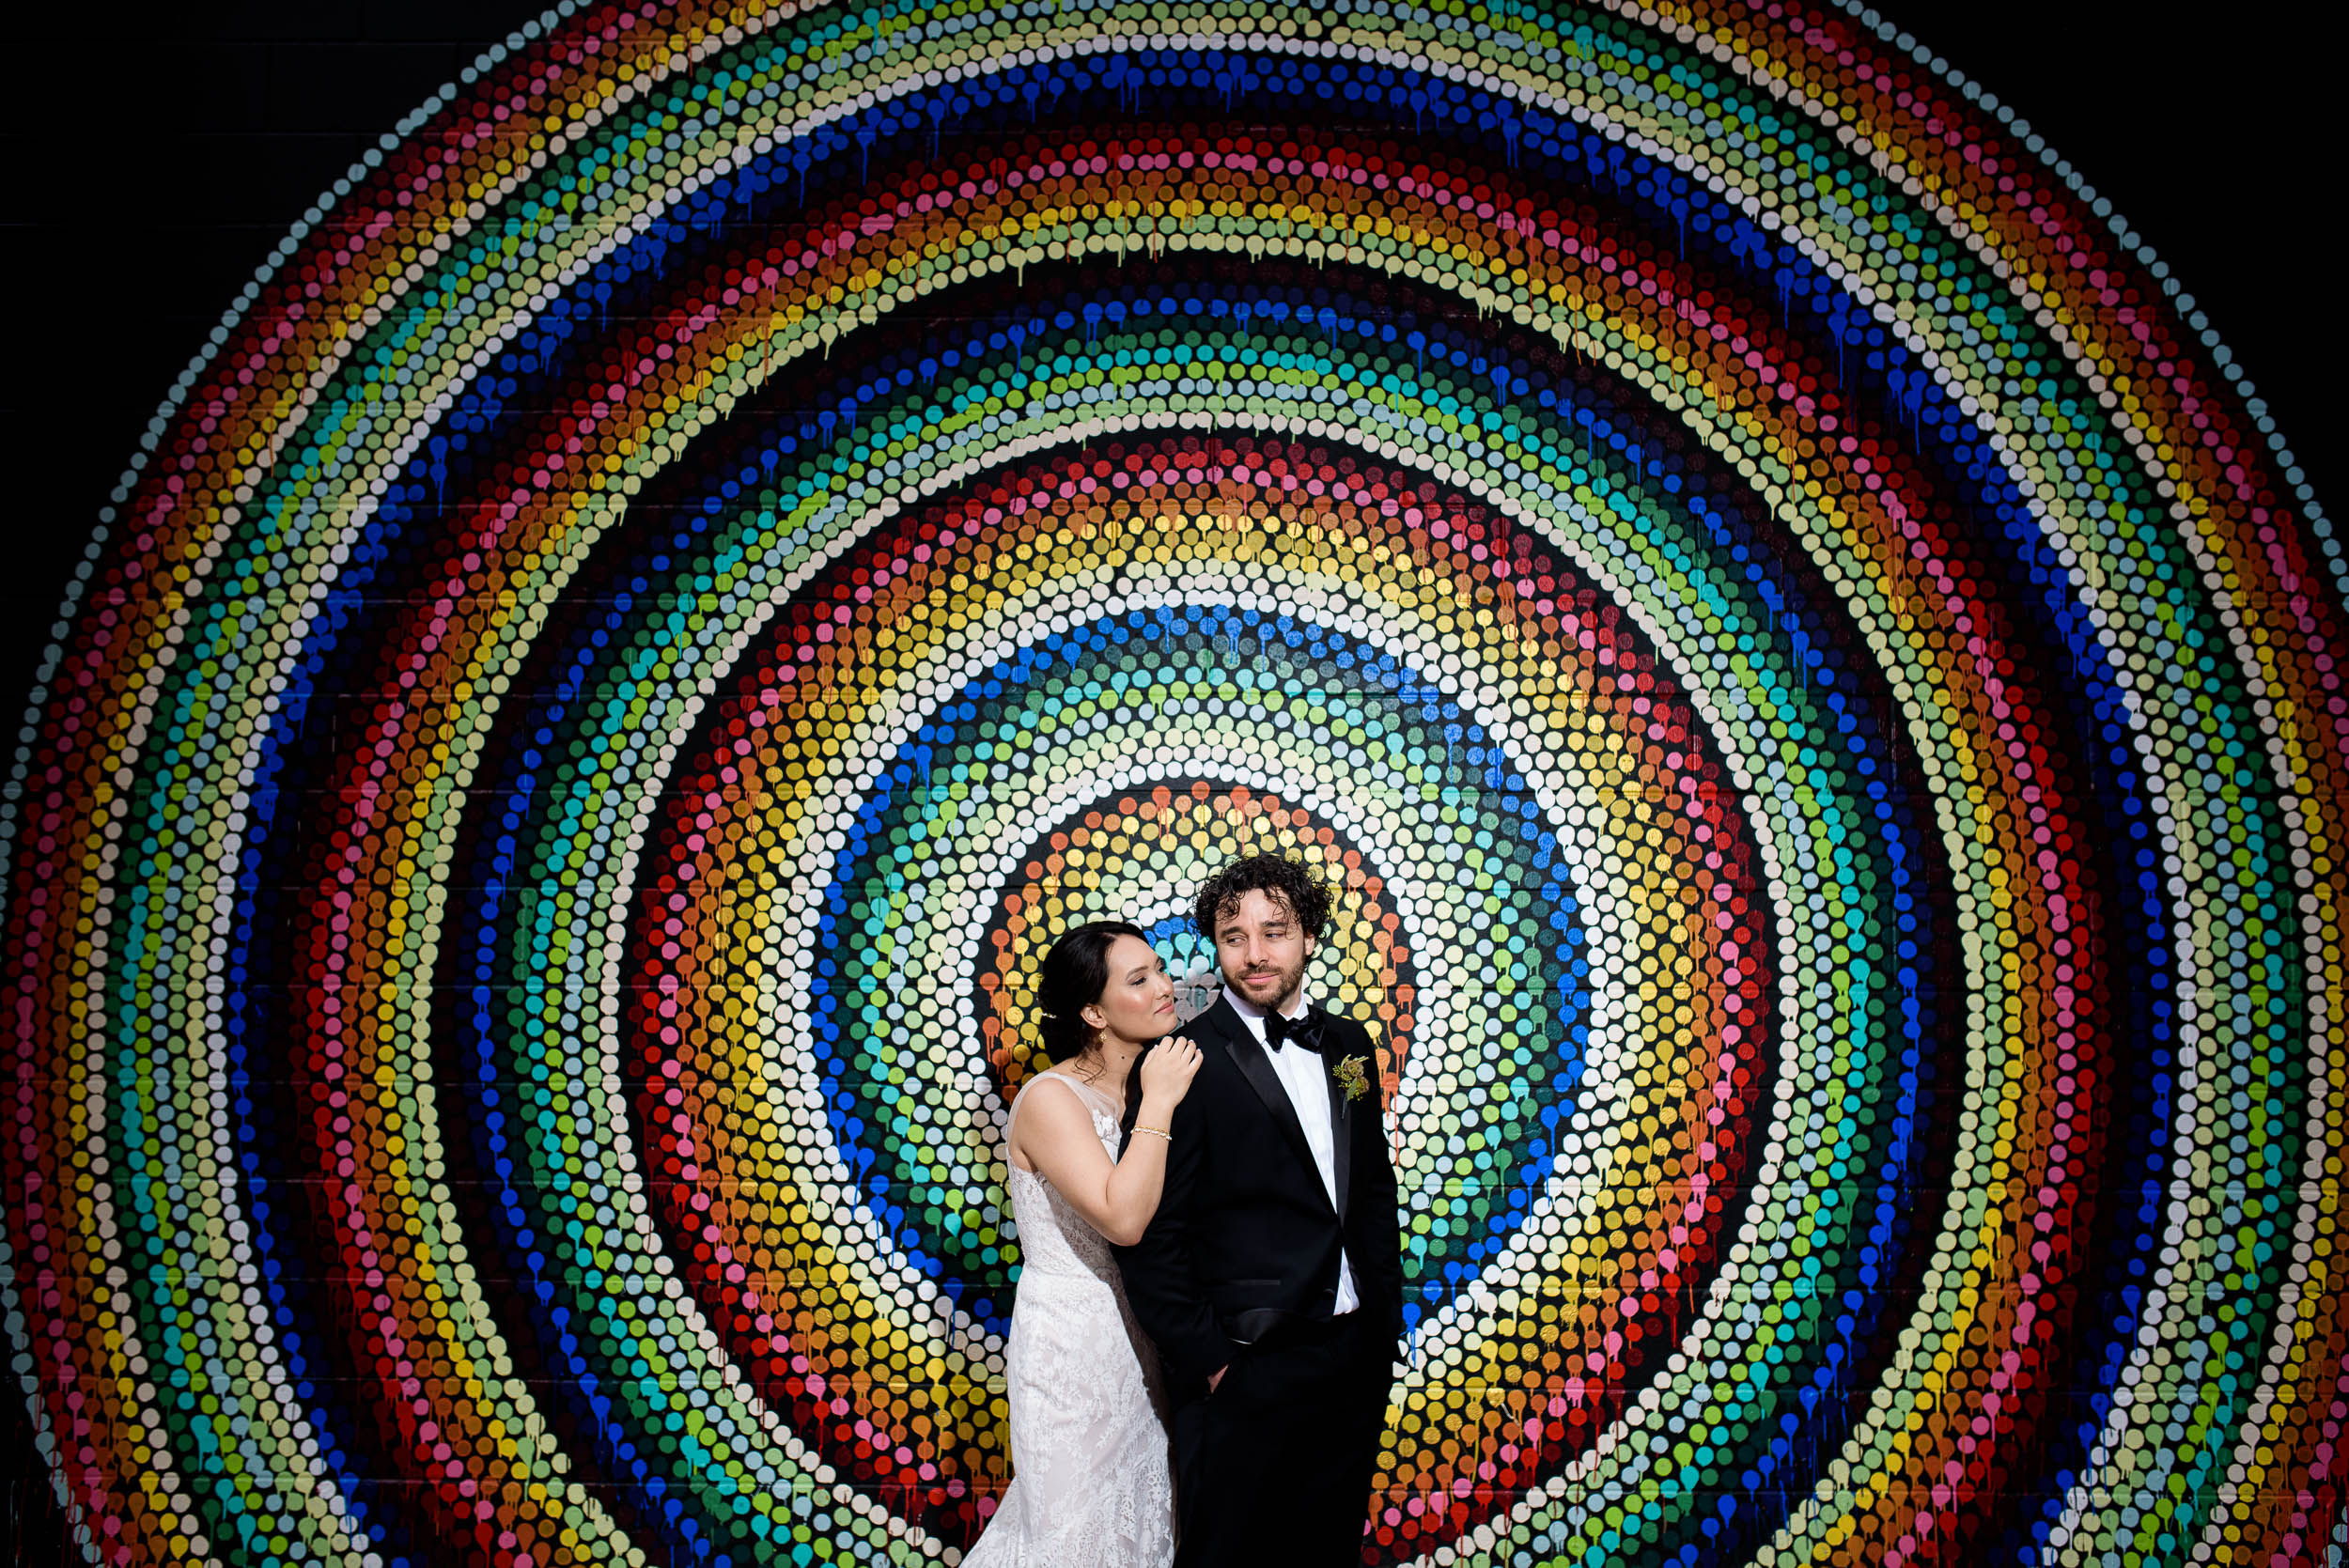 Chicago street art wedding photo before a Loft on Lake Chicago wedding.